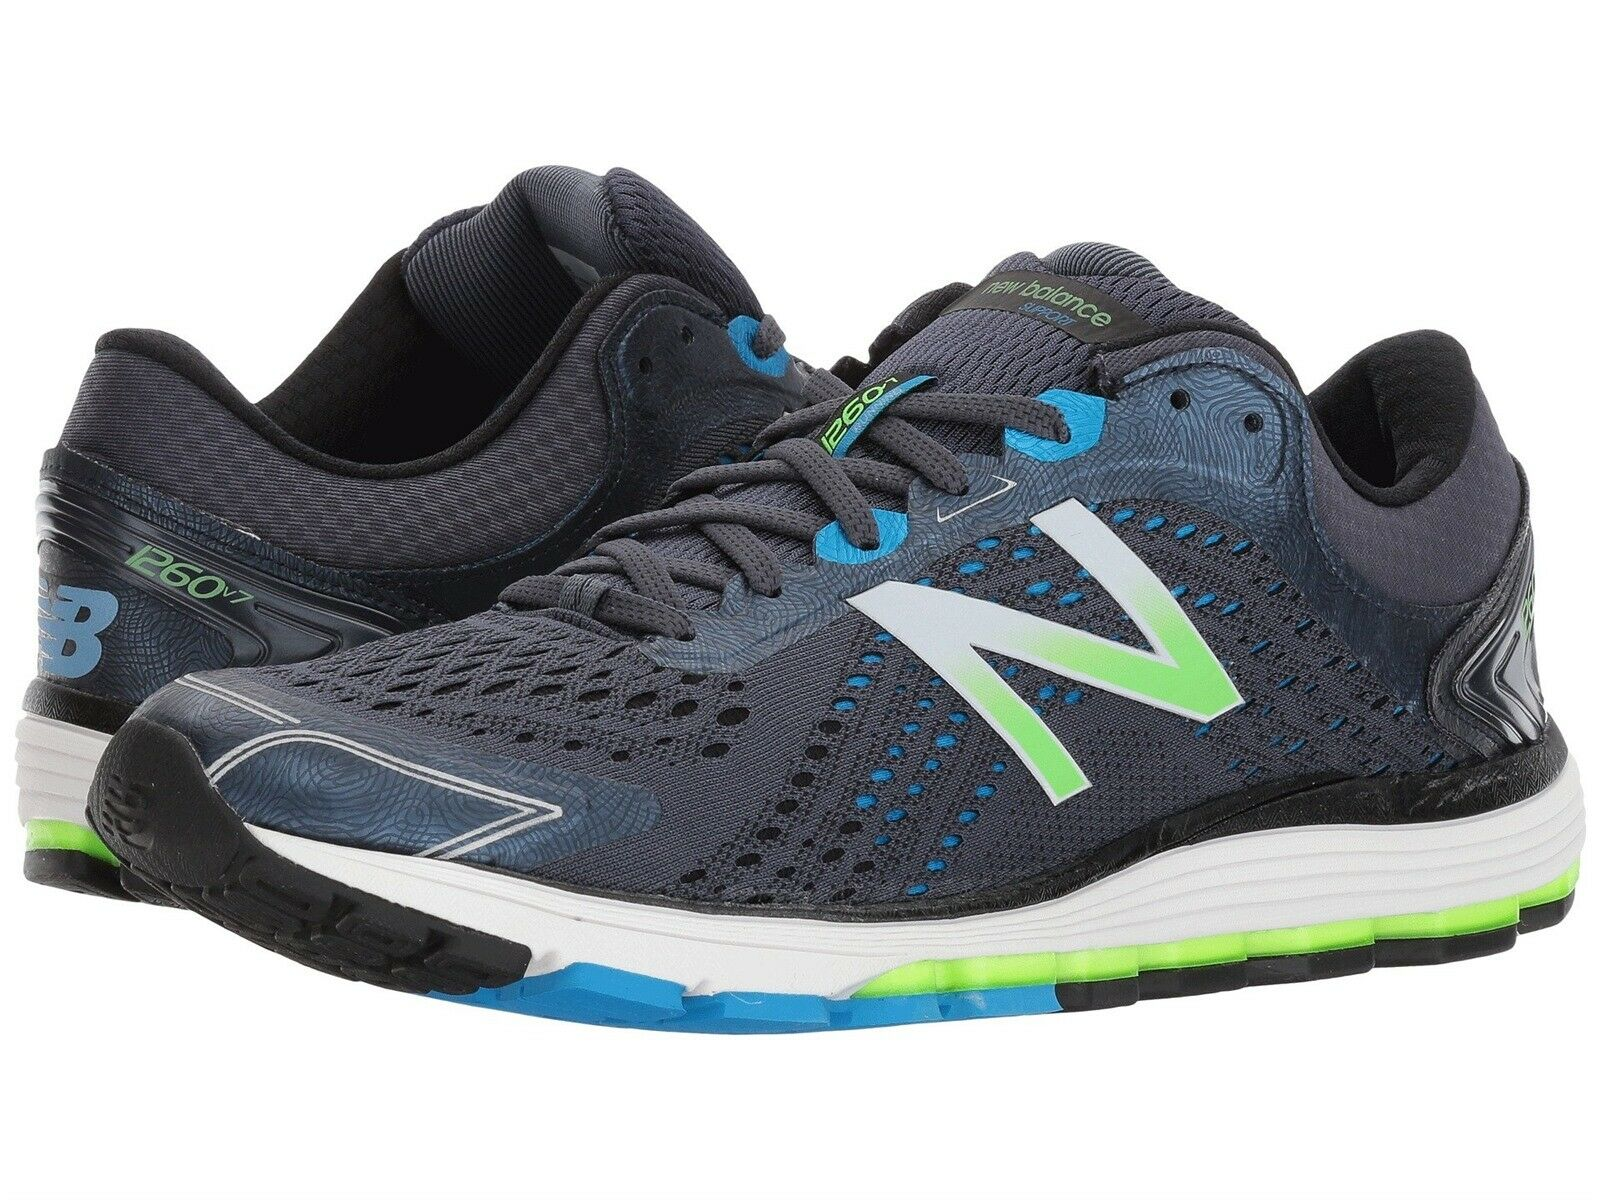 NEW BALANCE 1260v7 RUNNING scarpe Uomo Uomo Uomo Dimensione 11.5 FREE USA SHIPPING 22545c